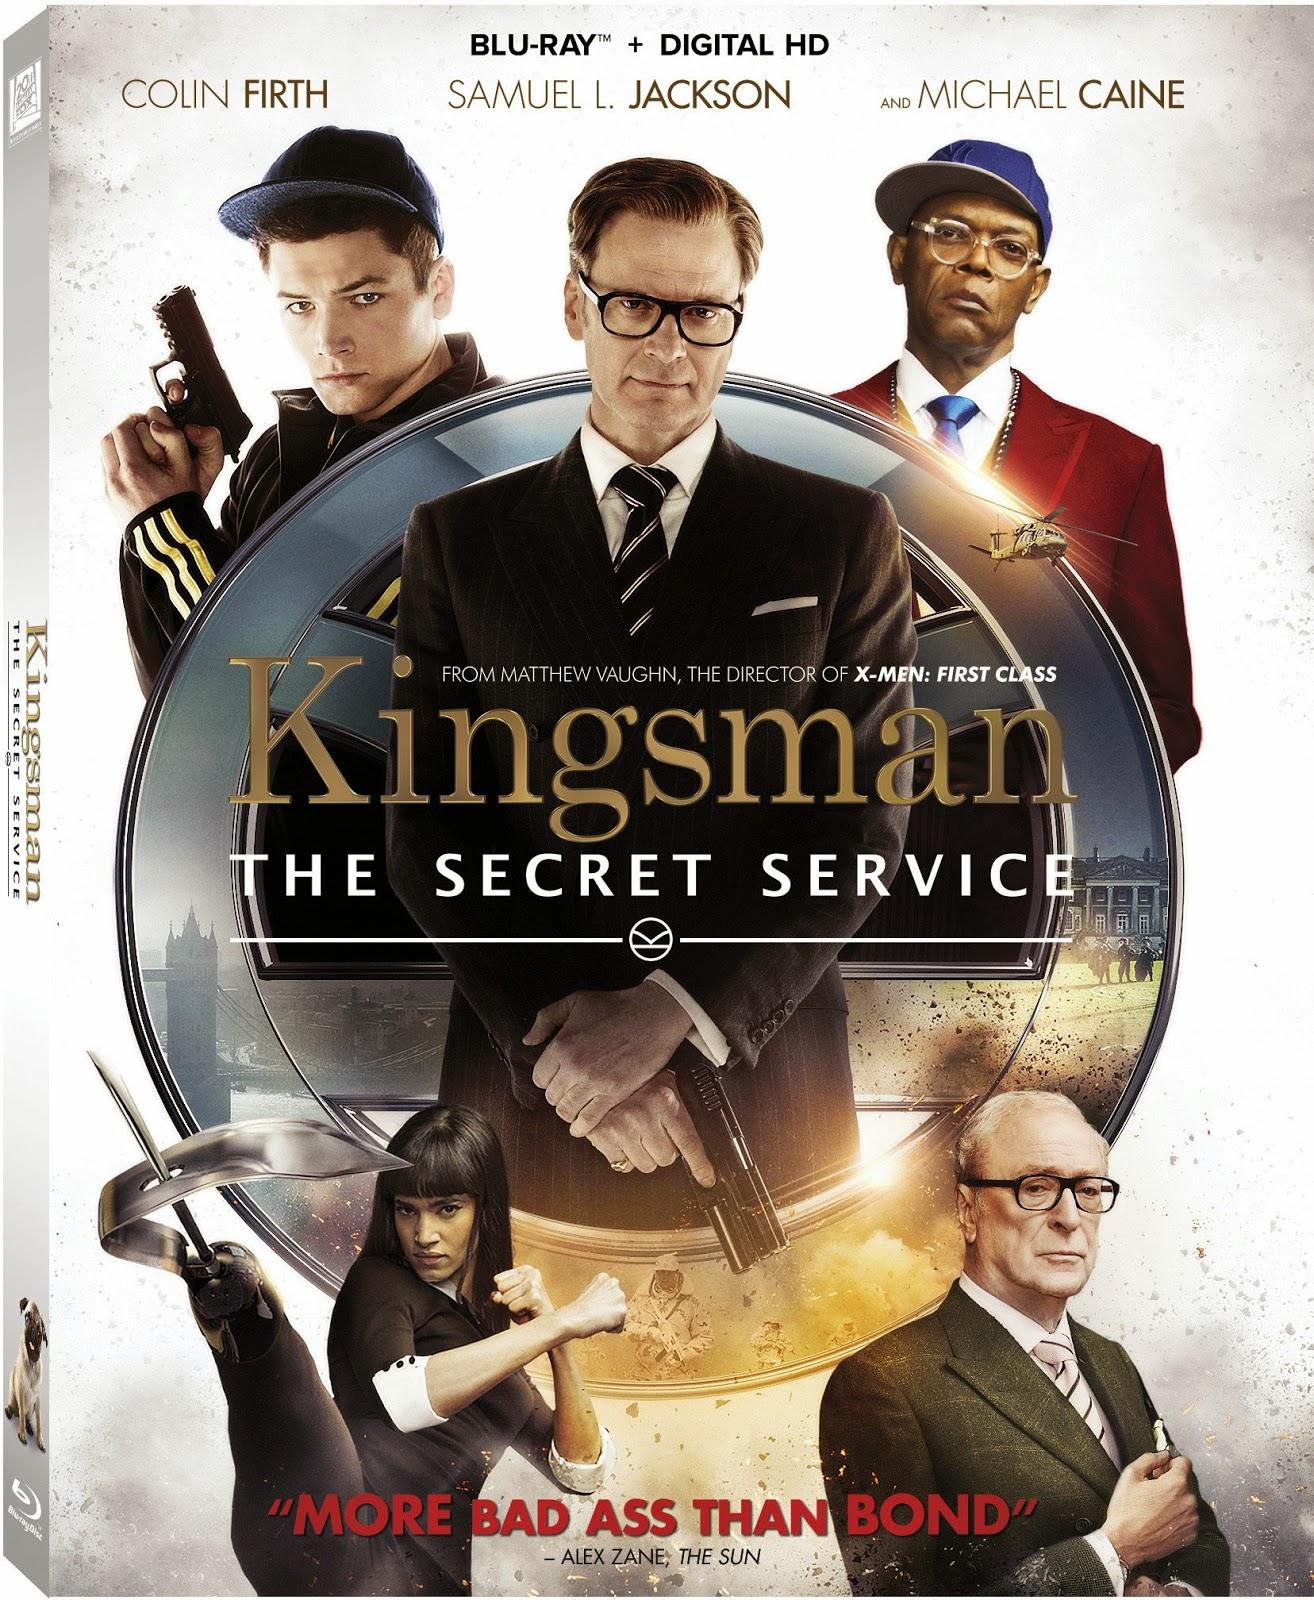 Kingsman El Servicio Secreto (2015) 1080p BD25 Cover Caratula